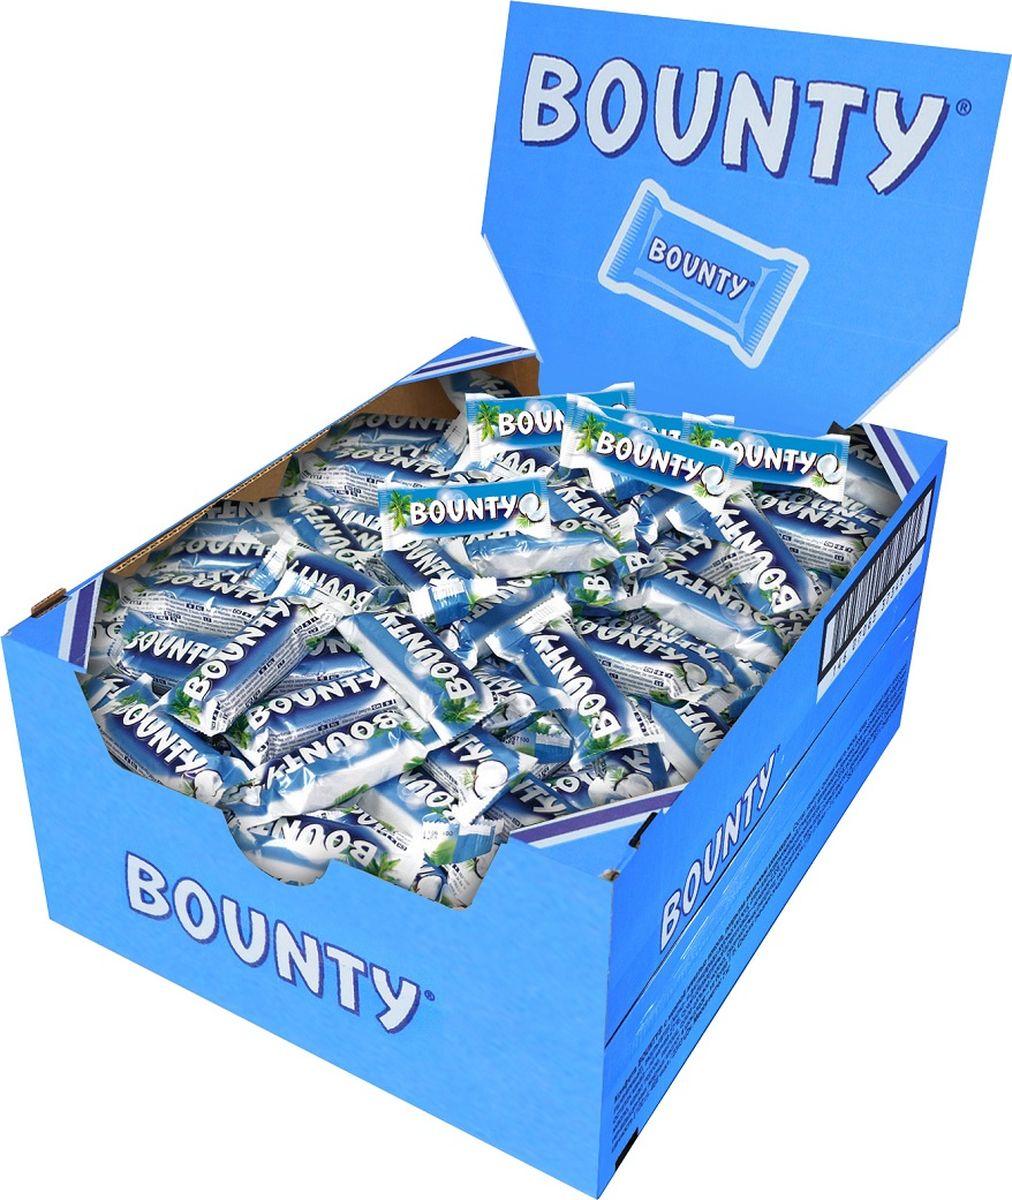 Bounty Minis шоколадный батончик, 1 кг snickers minis с семечками шоколадный батончик 2 9 кг